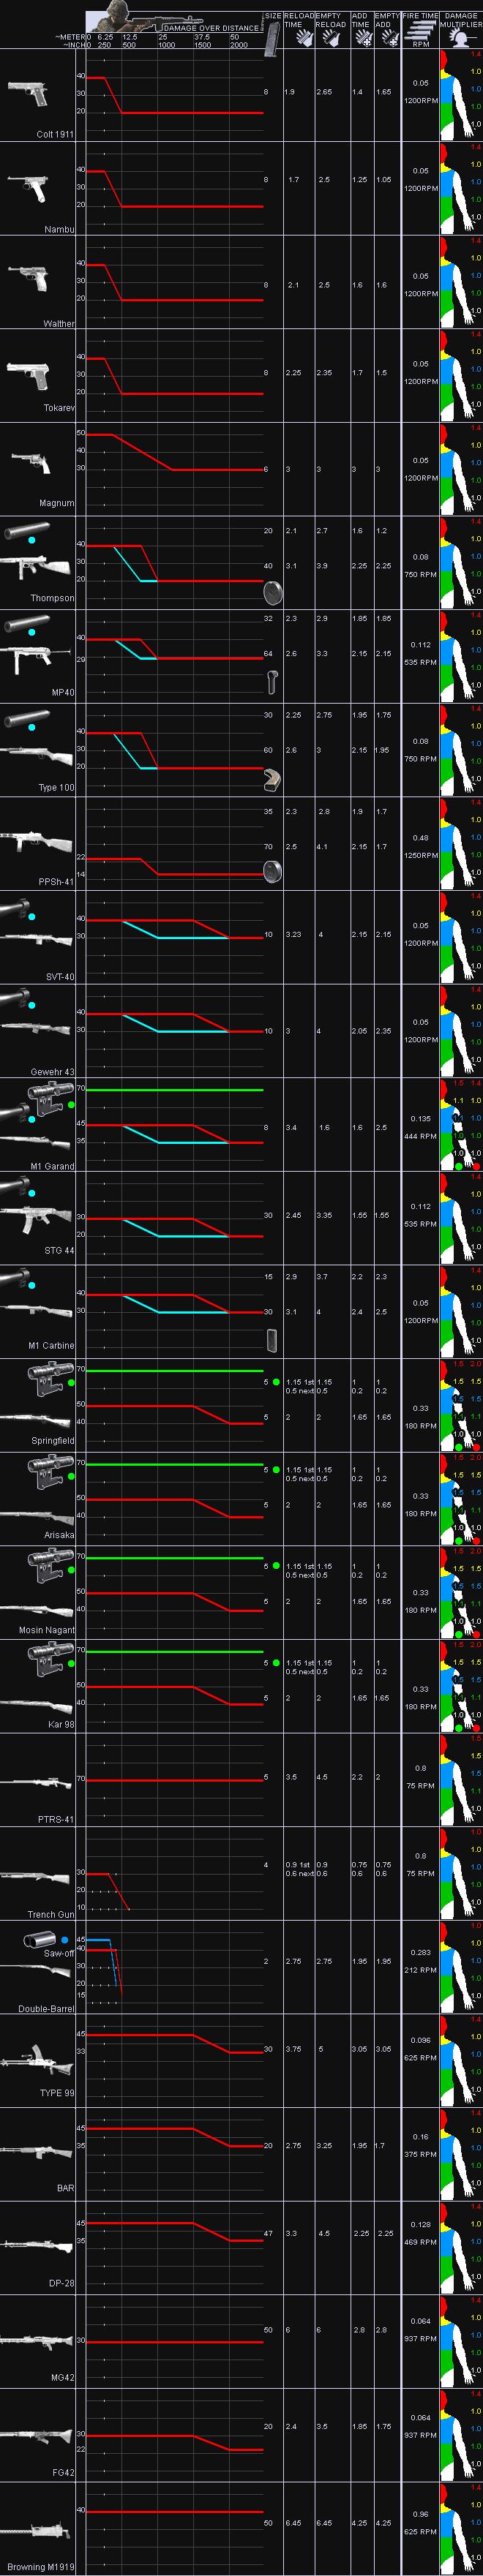 CoD4 Bullet Penetration Chart